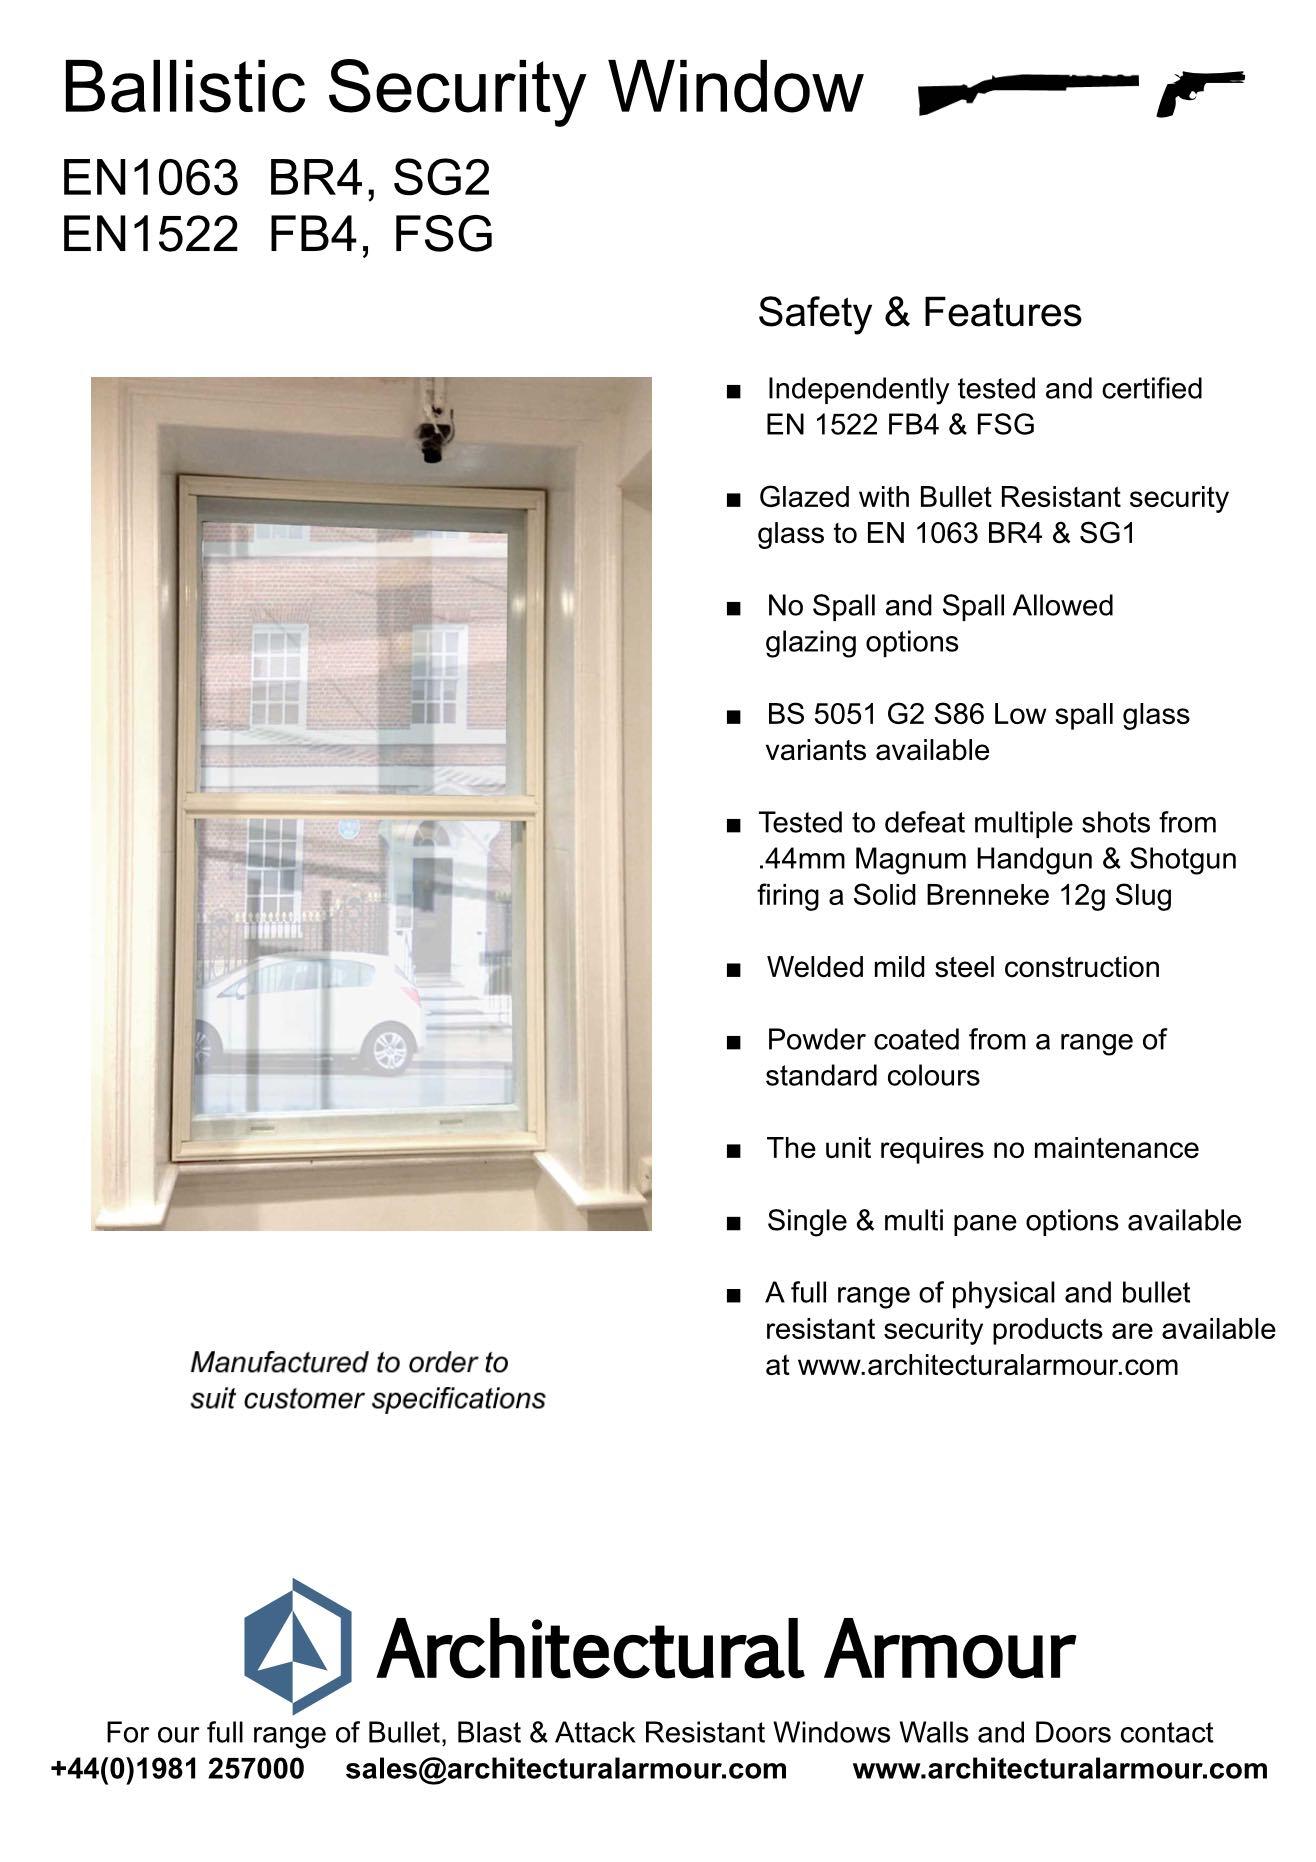 EN 1063 BR4 EN 1522 FB4 Bullet Resistant Window